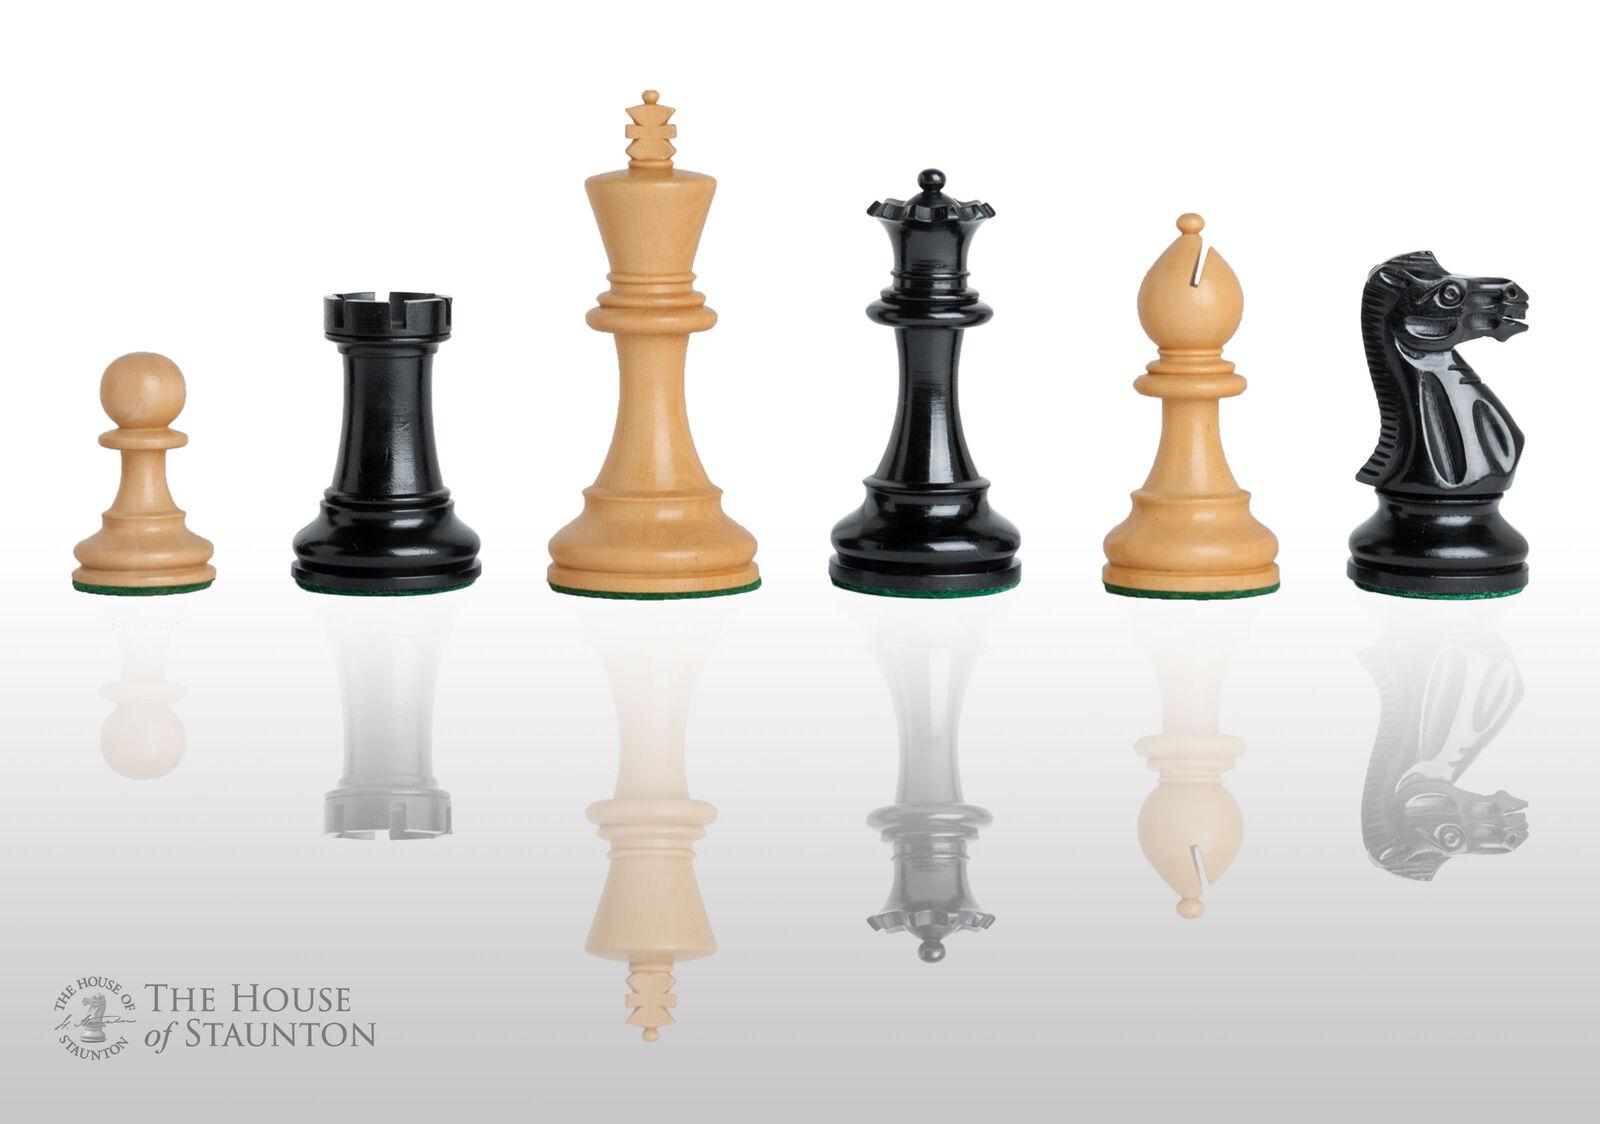 USCF ventes le Grandmaster Chess Set-pièces seulement - 4.0  King-ebonized boxwoo